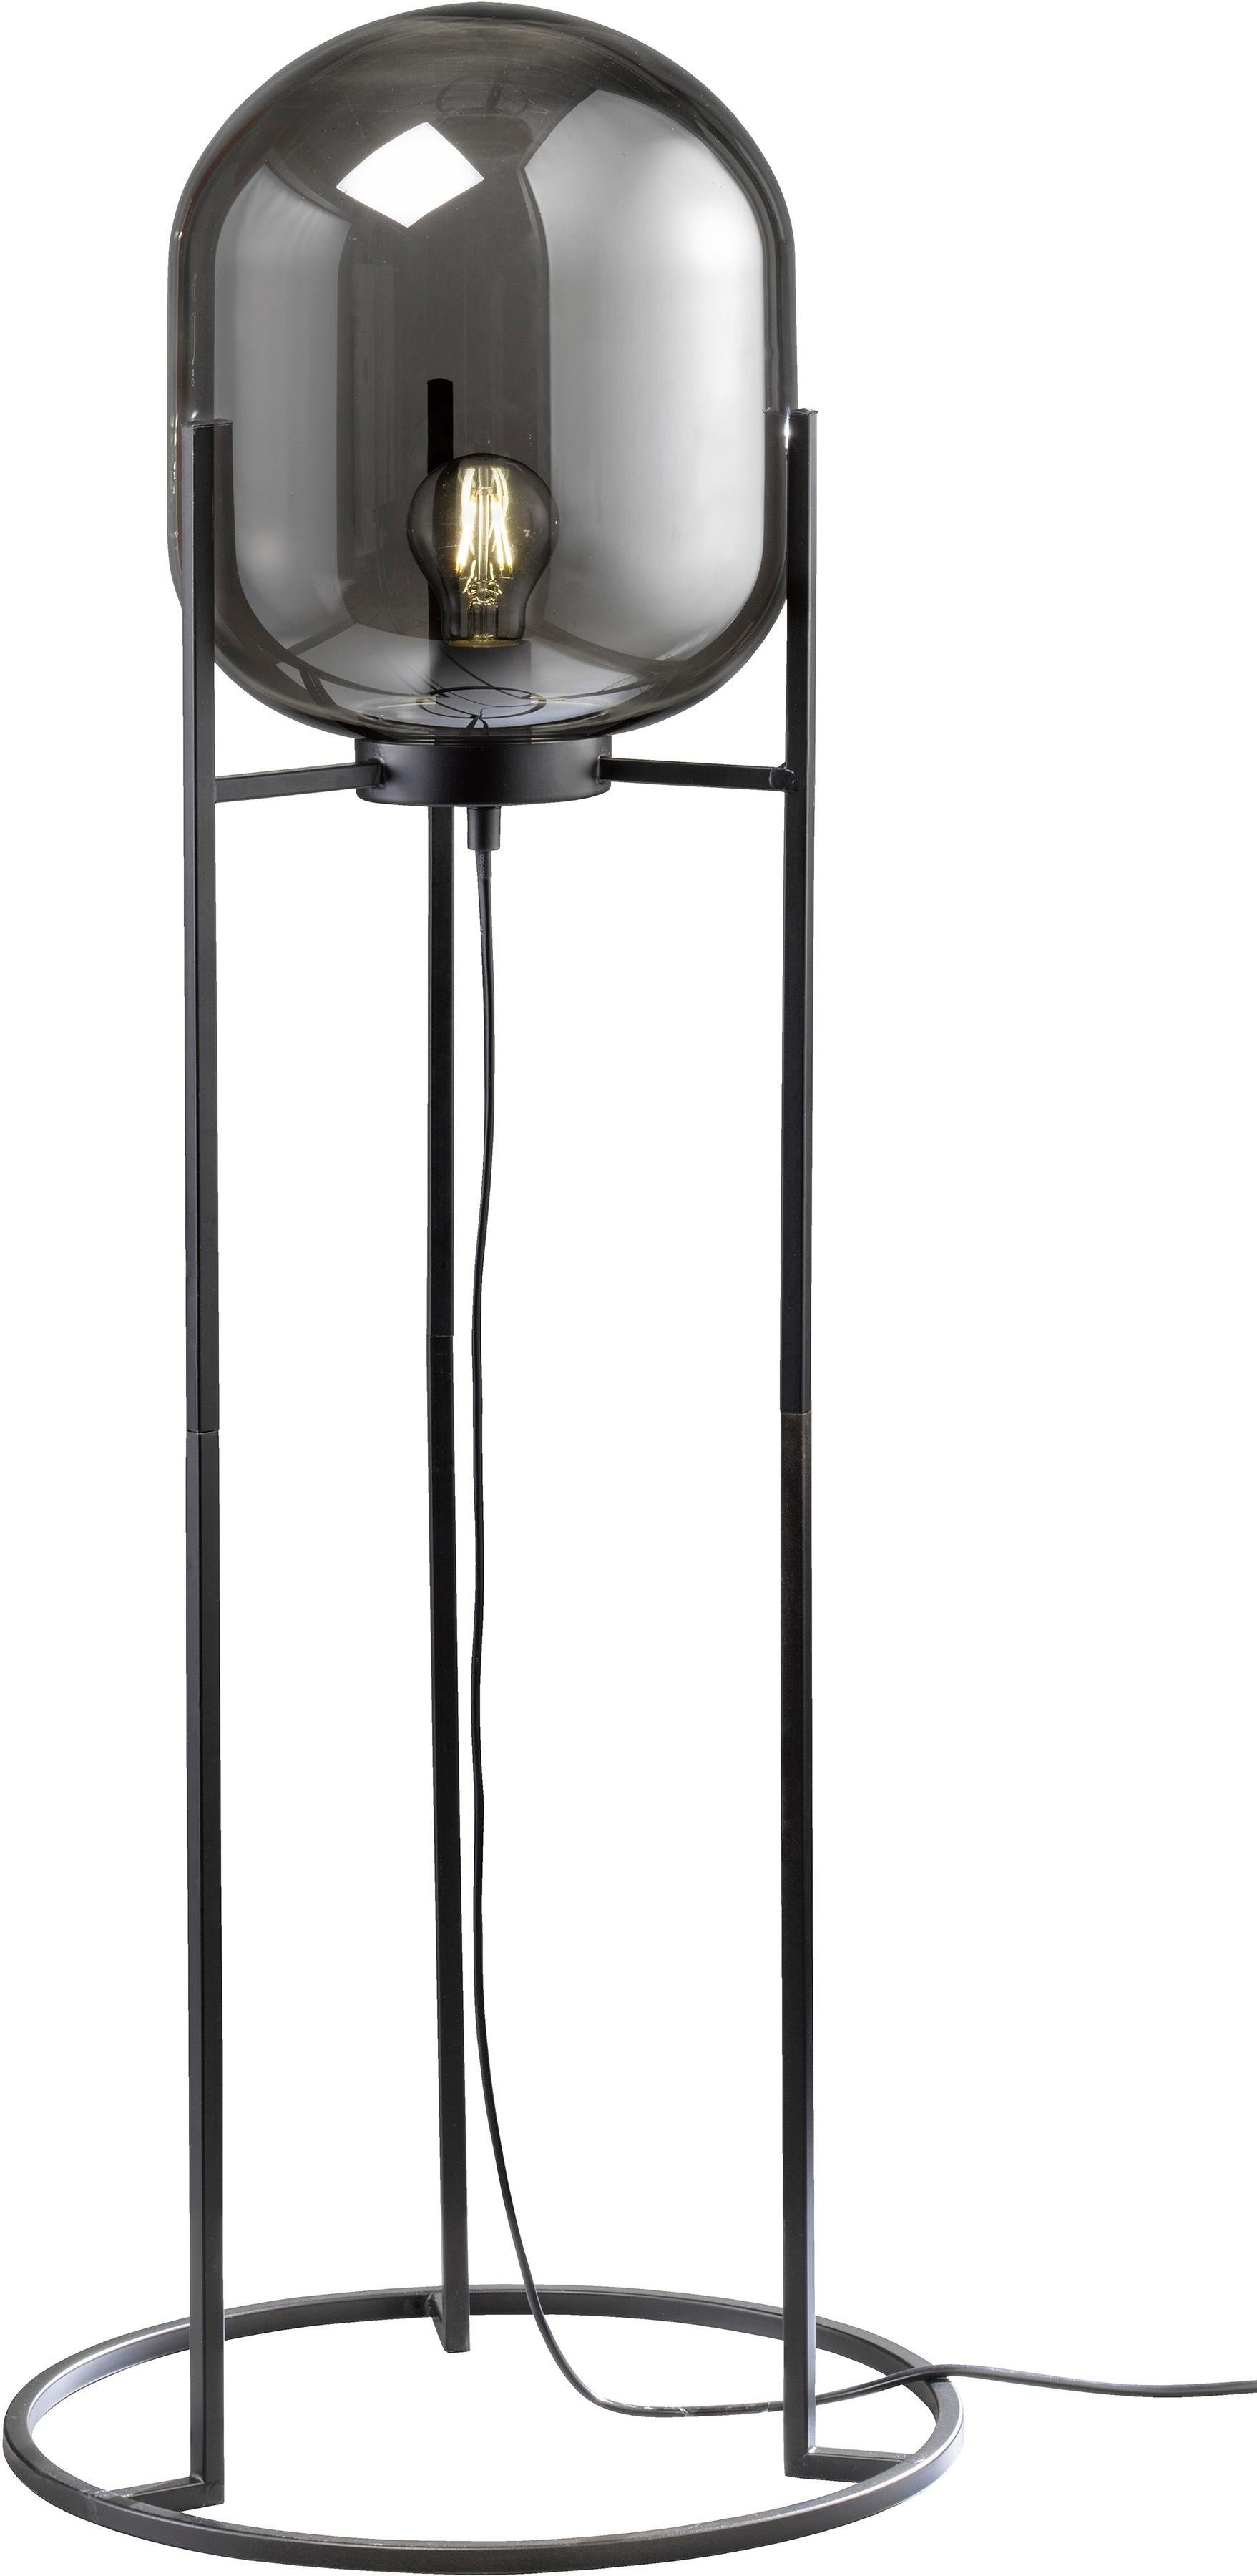 FISCHER & HONSEL staande lamp »Regi«, - verschillende betaalmethodes